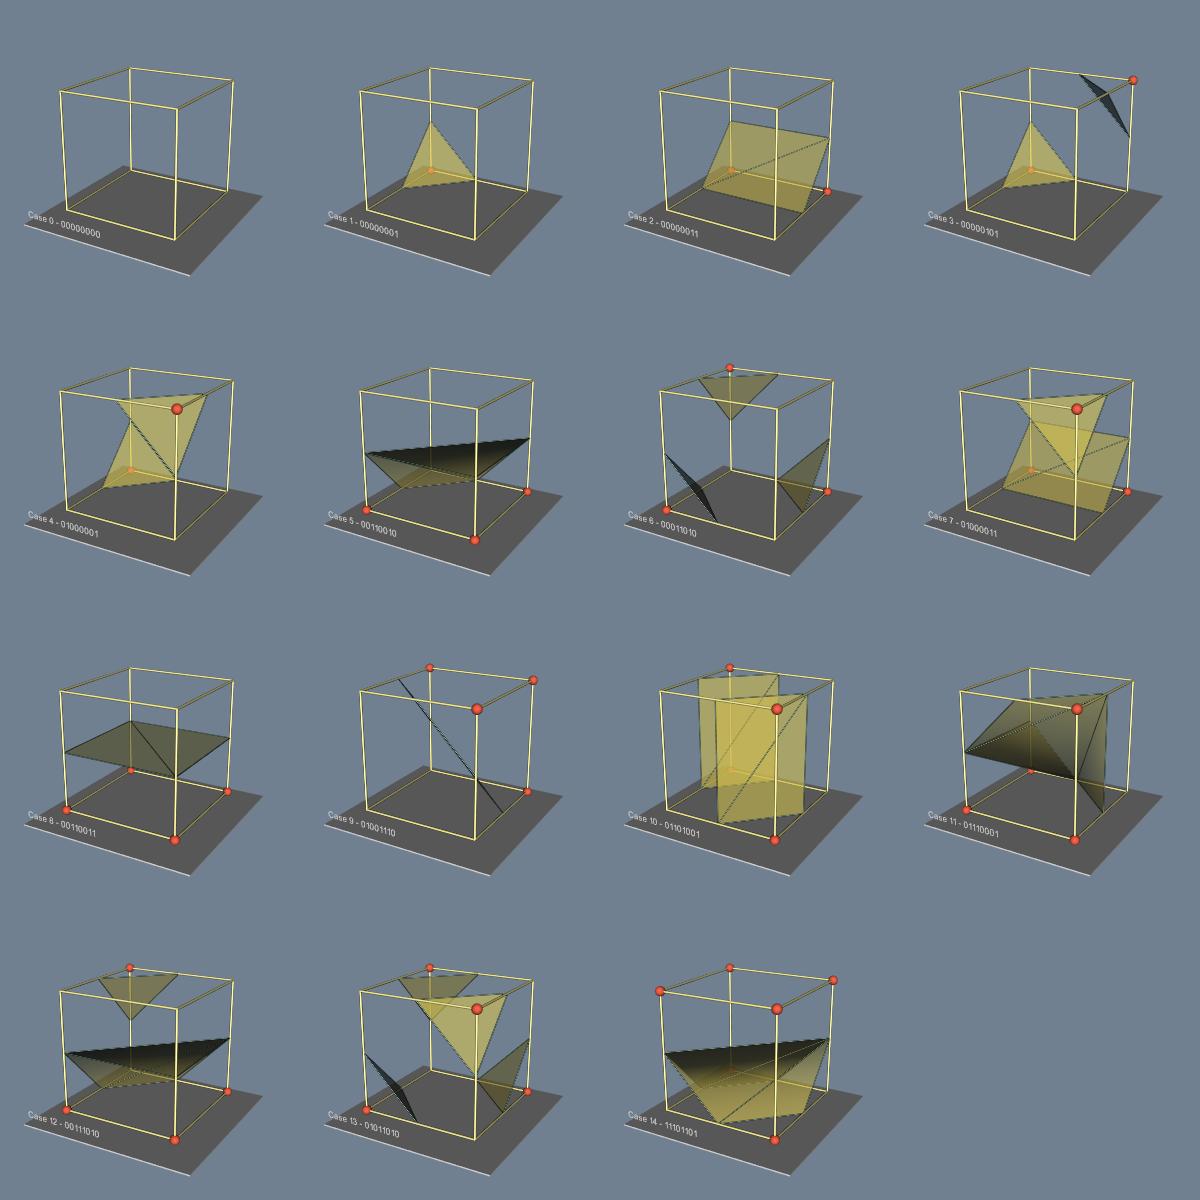 Figure 6-6